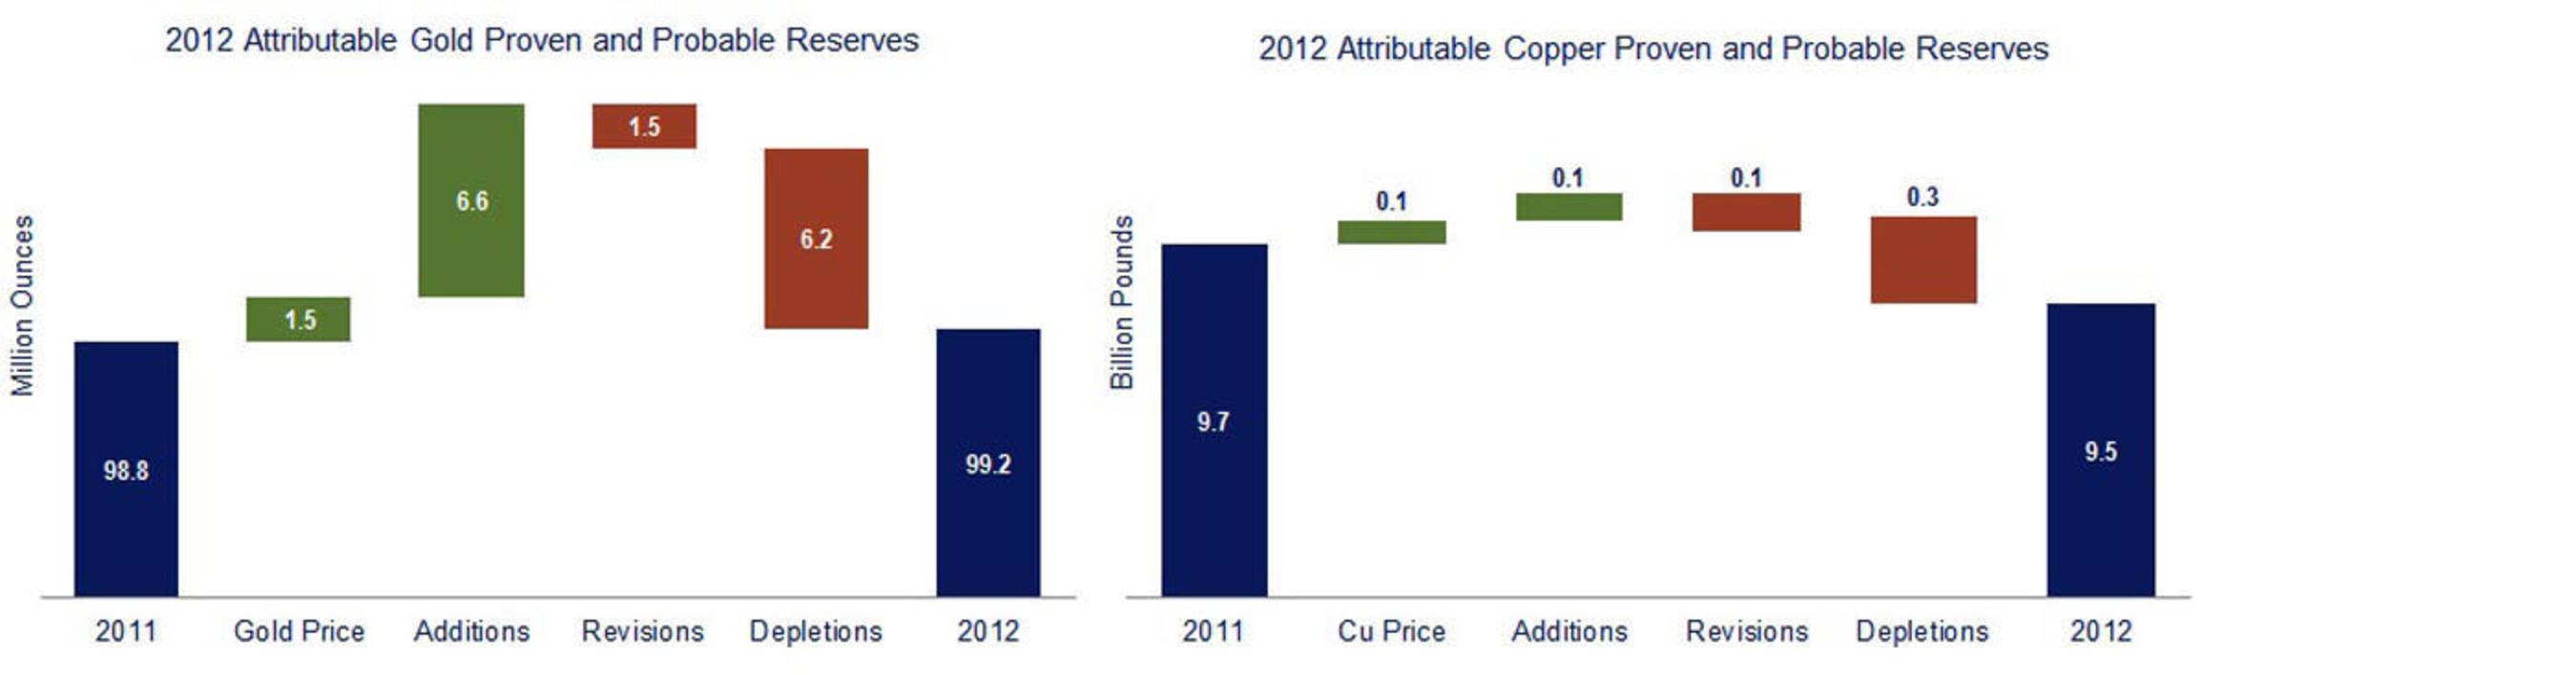 2012 Reserves. (PRNewsFoto/Newmont Mining Corporation) (PRNewsFoto/NEWMONT MINING CORPORATION)